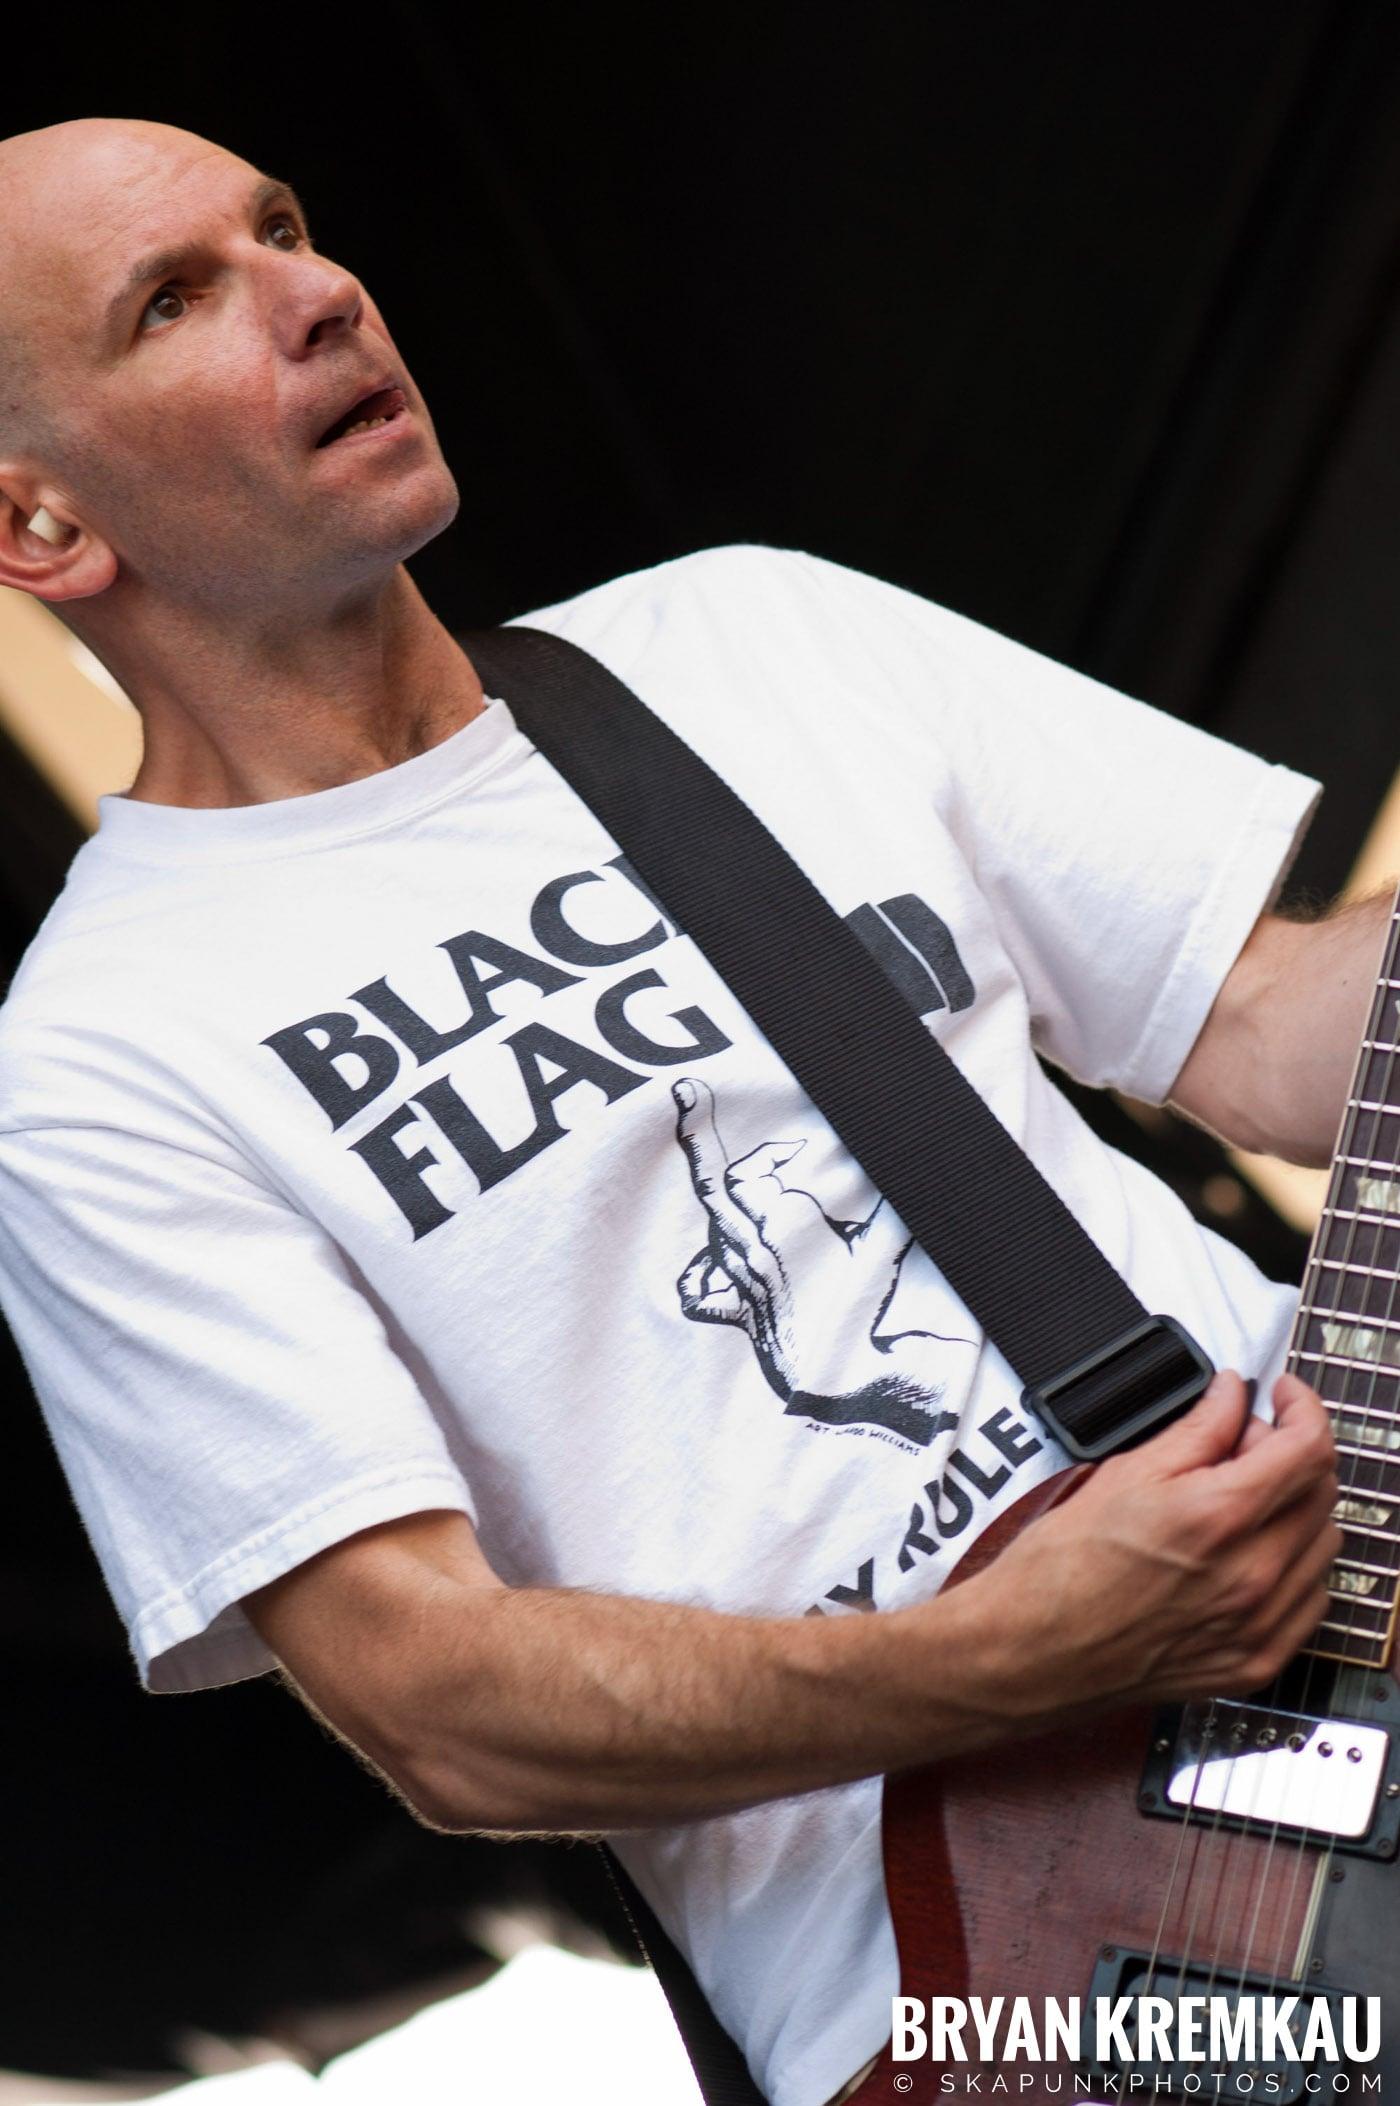 Bad Religion @ Warped Tour 2007, Scranton PA - 7.26.07 (2)